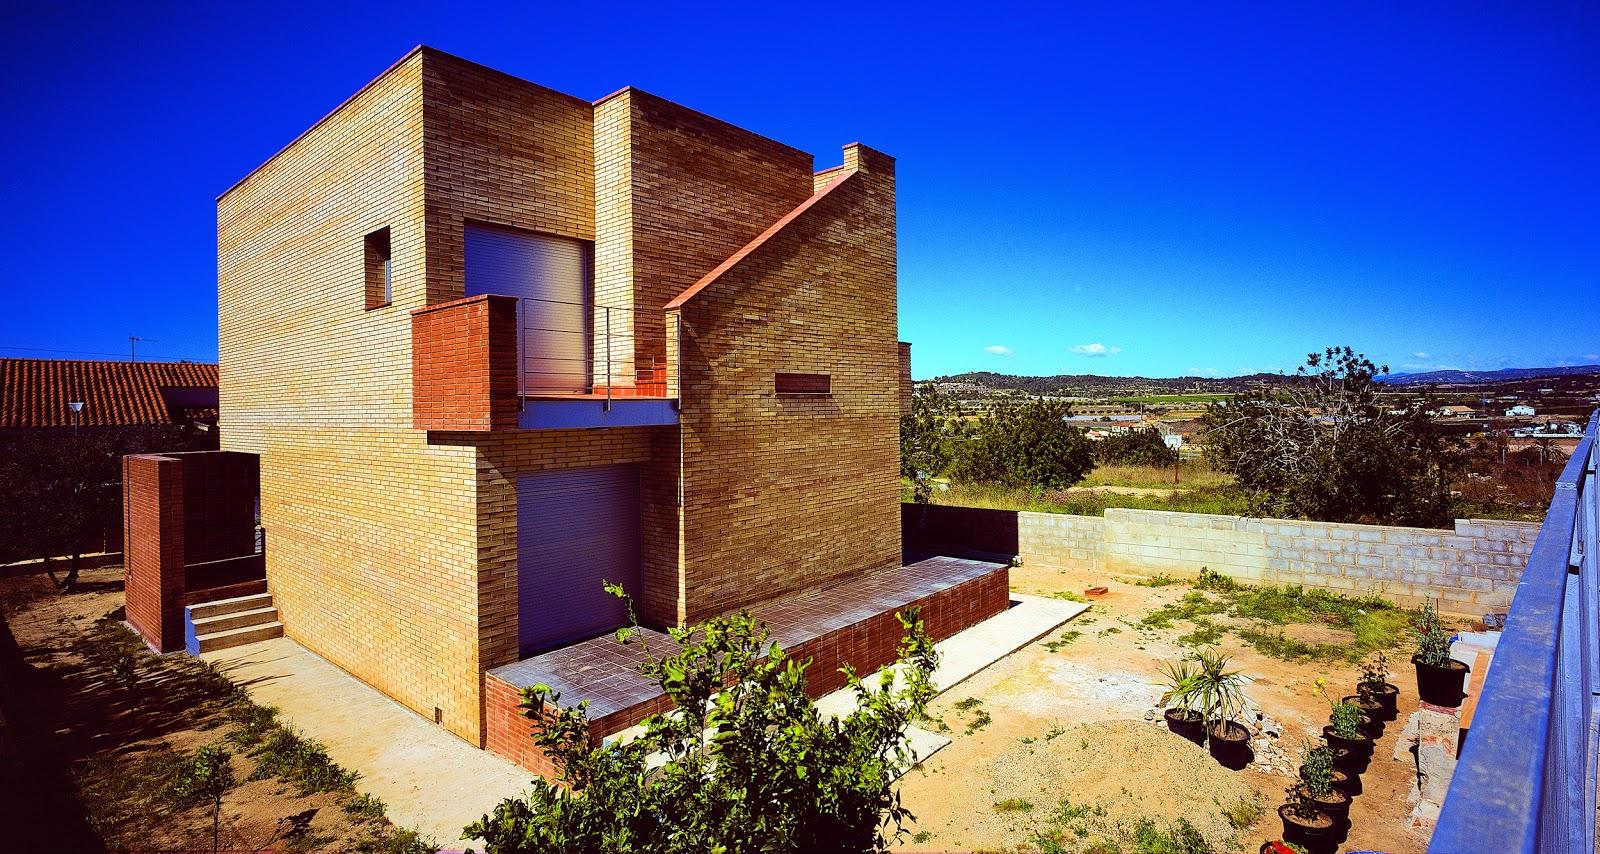 Aguilera guerrero agua arquitectos casa julio - Arquitectos tarragona ...